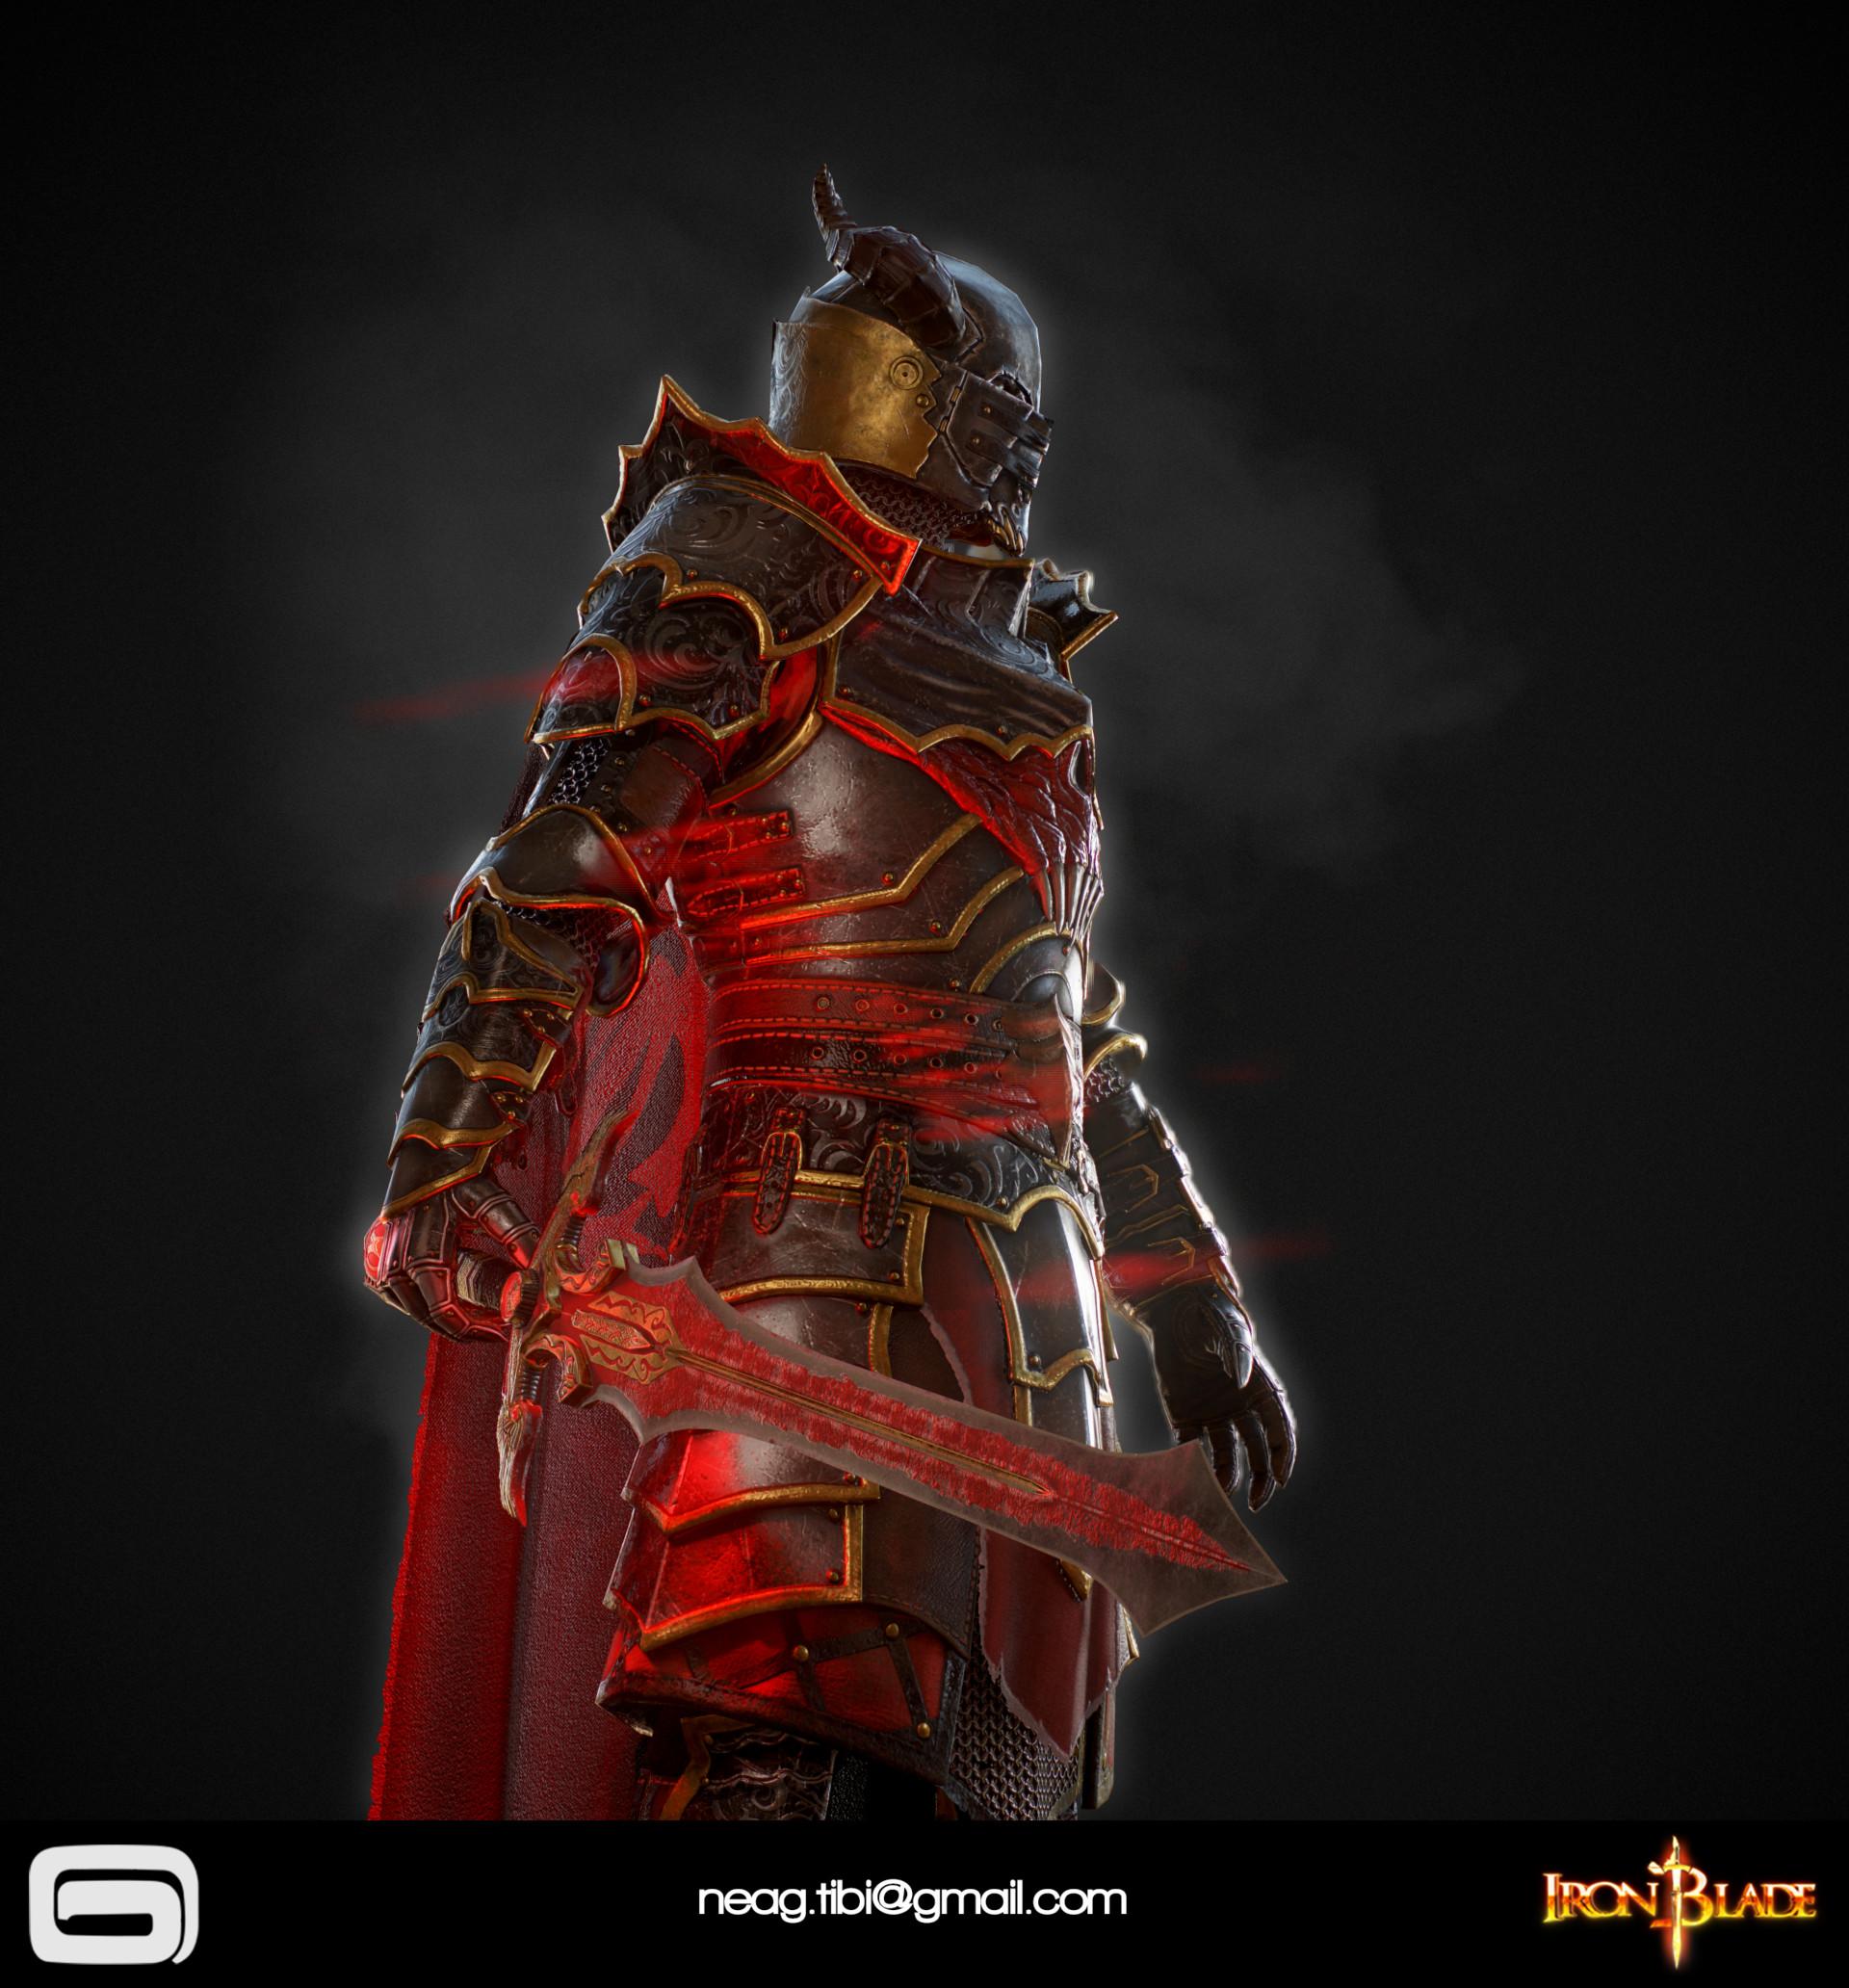 Tibi neag tibi neag iron blade mc armor 10c low poly 09